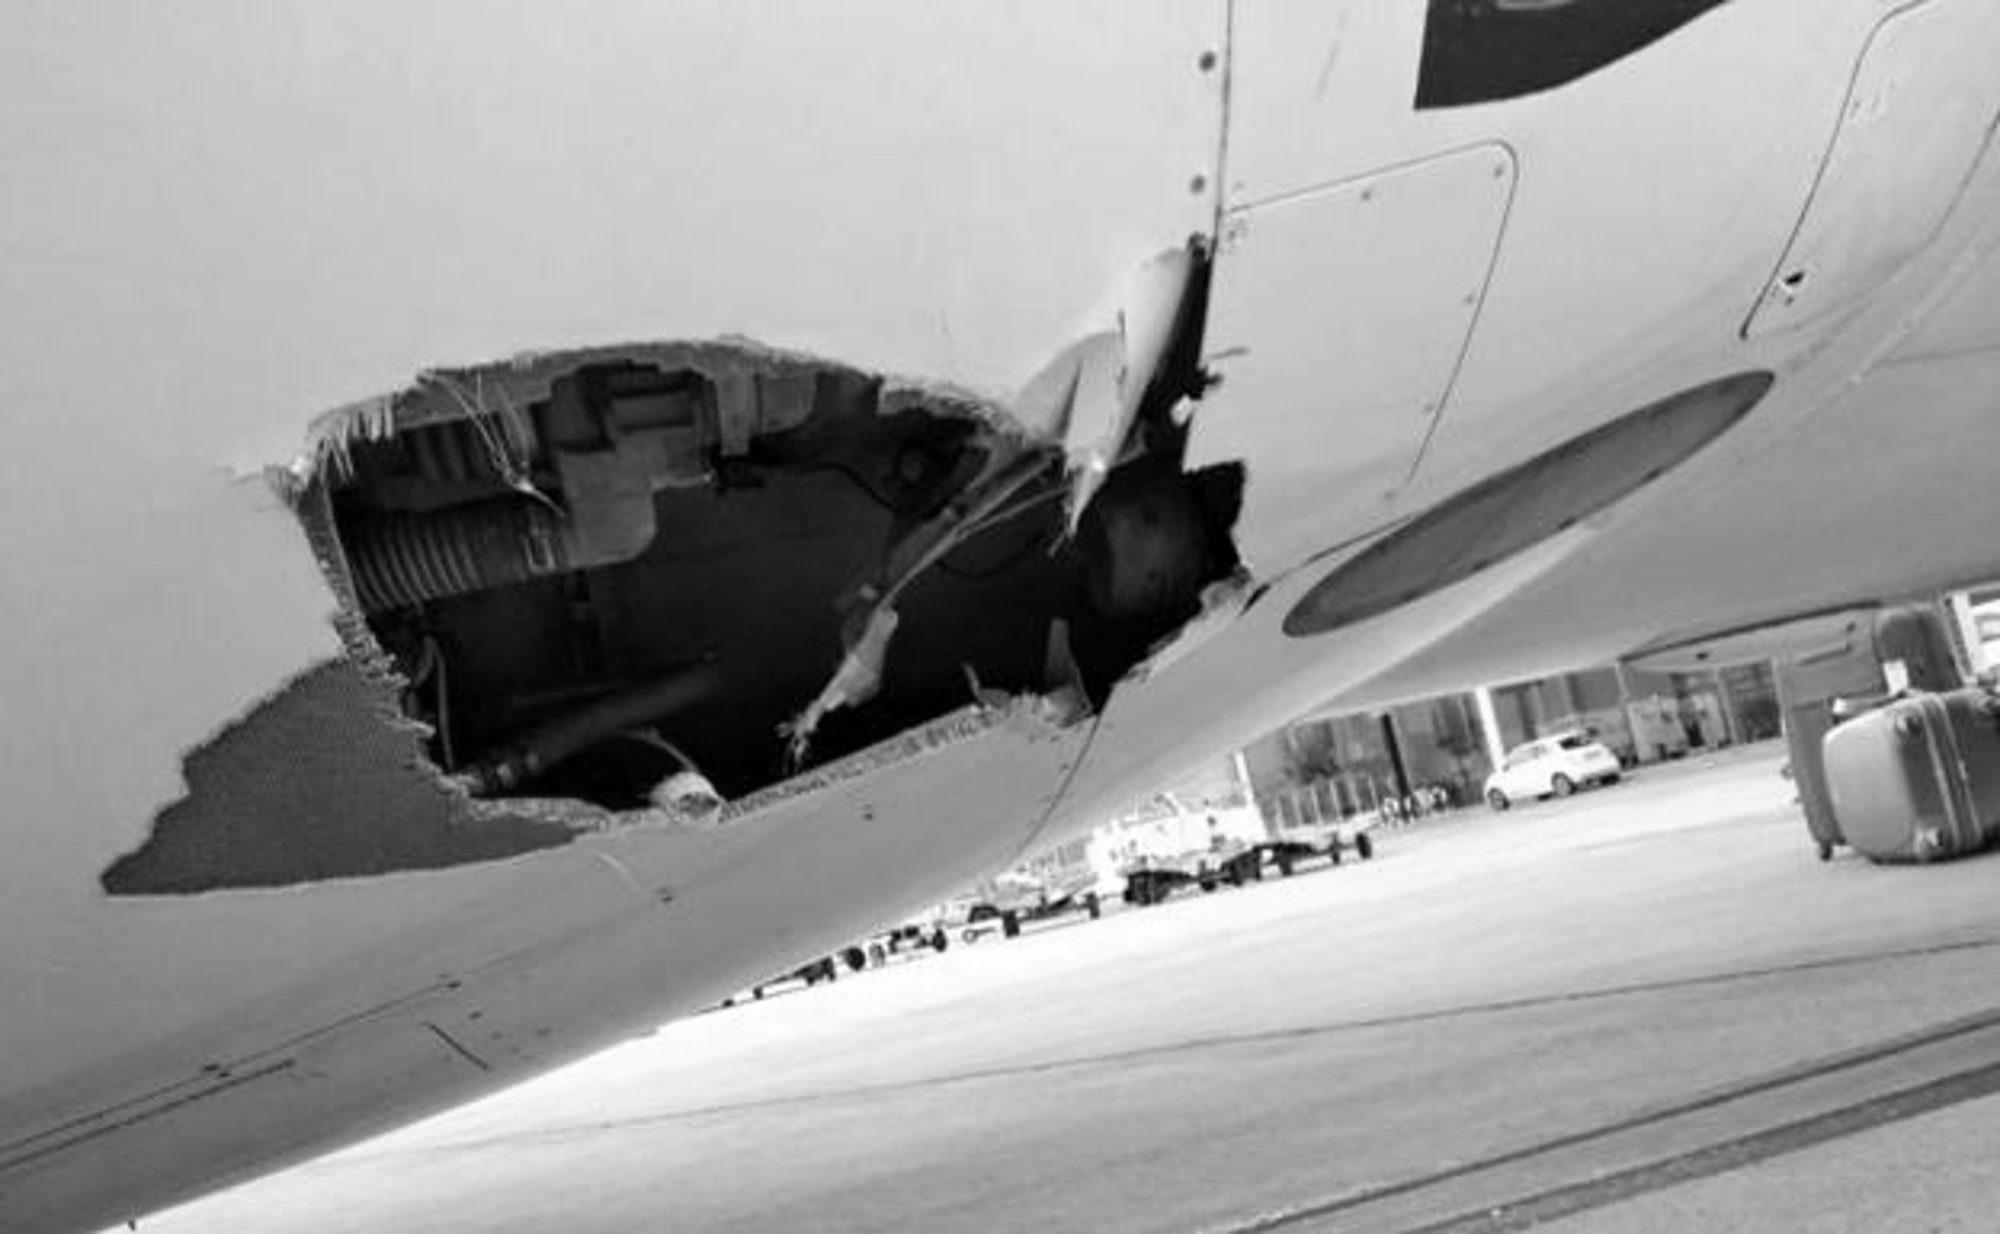 Majorca Plane Blown Off Course In Runway Crash